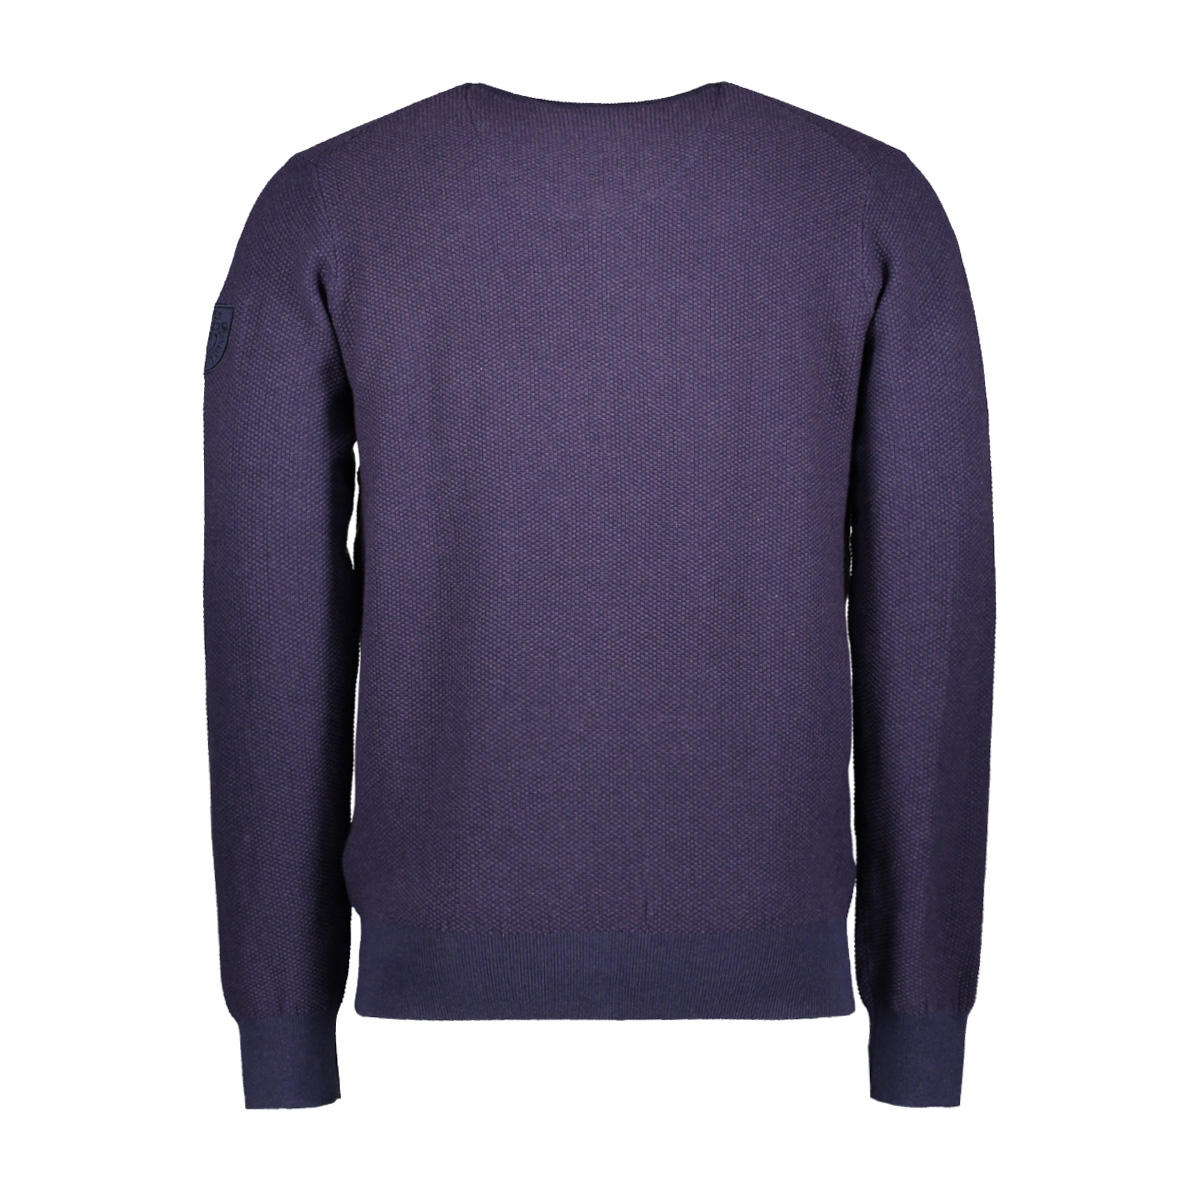 121-37019 bluefields sweater 5968